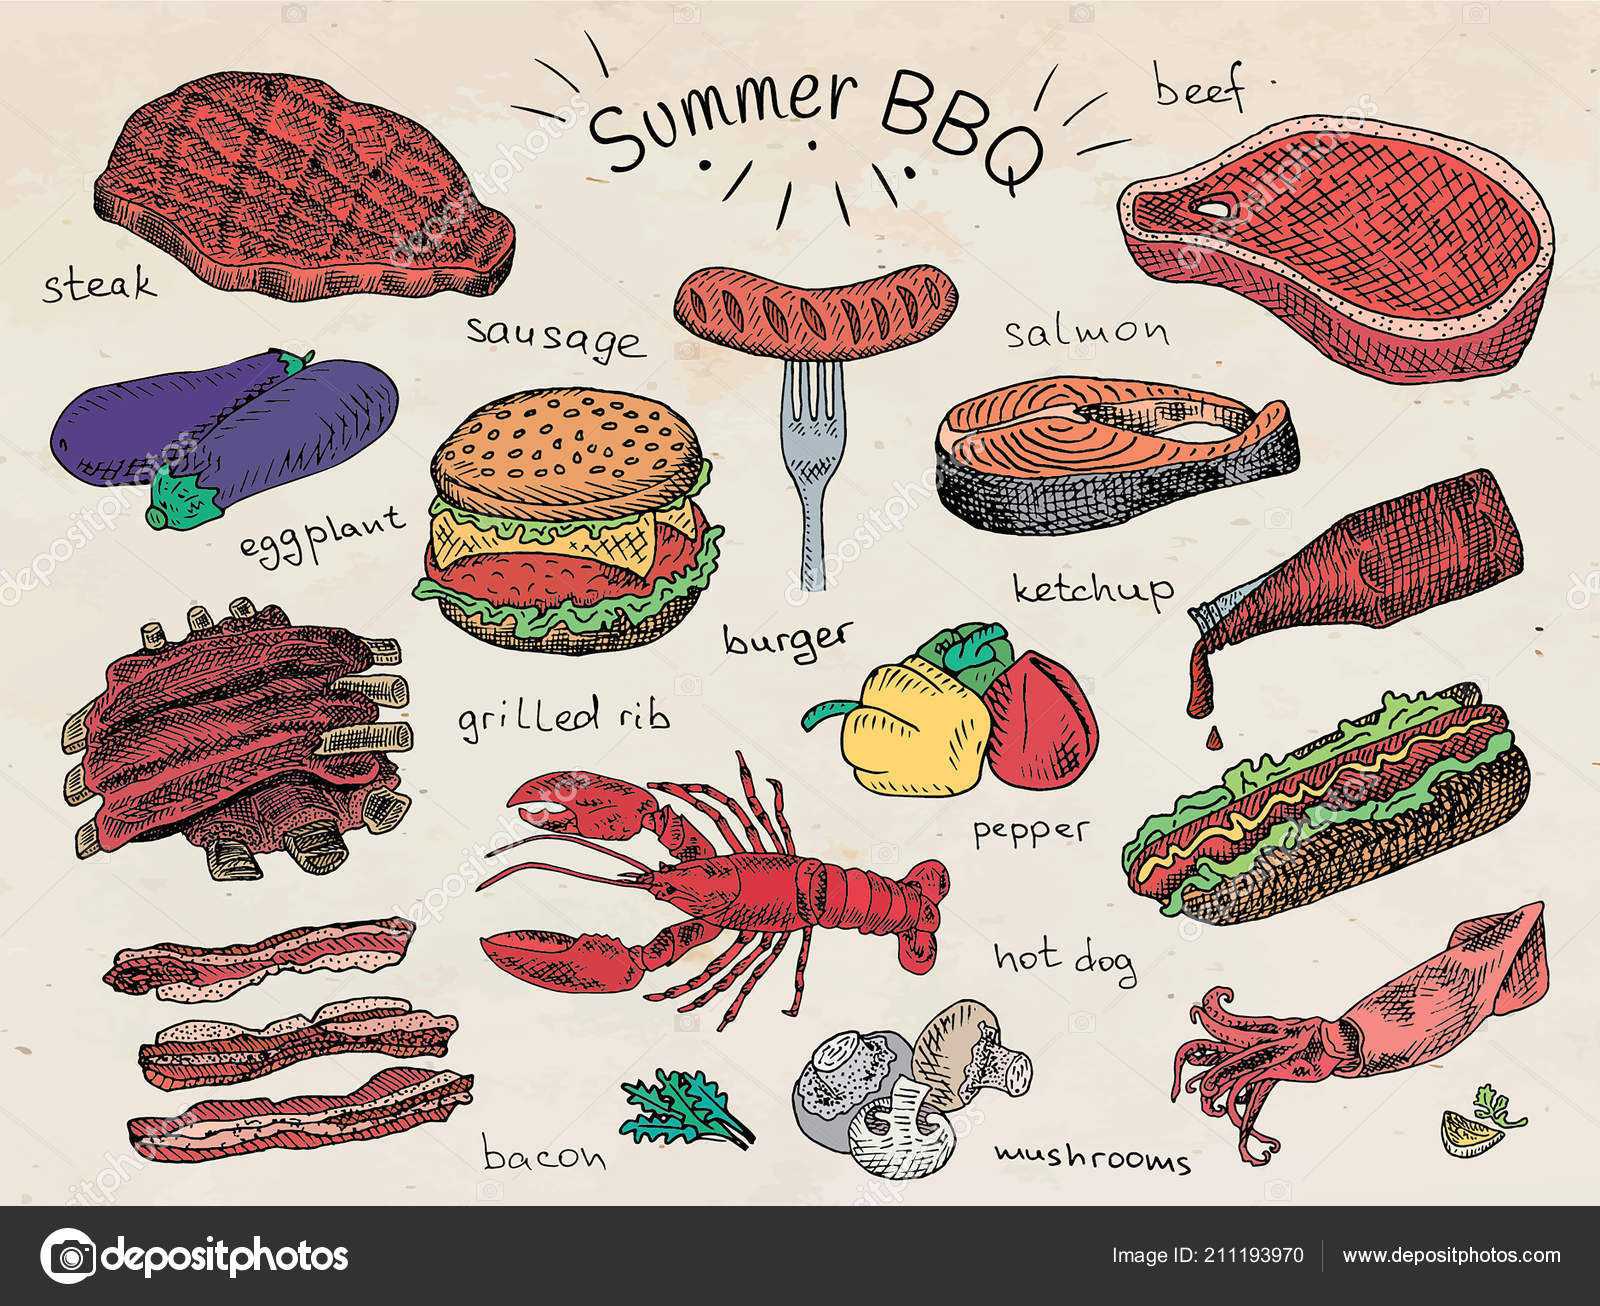 Beautiful Illustration Summer Bbq Food Ribs Sausage Beef Steak.